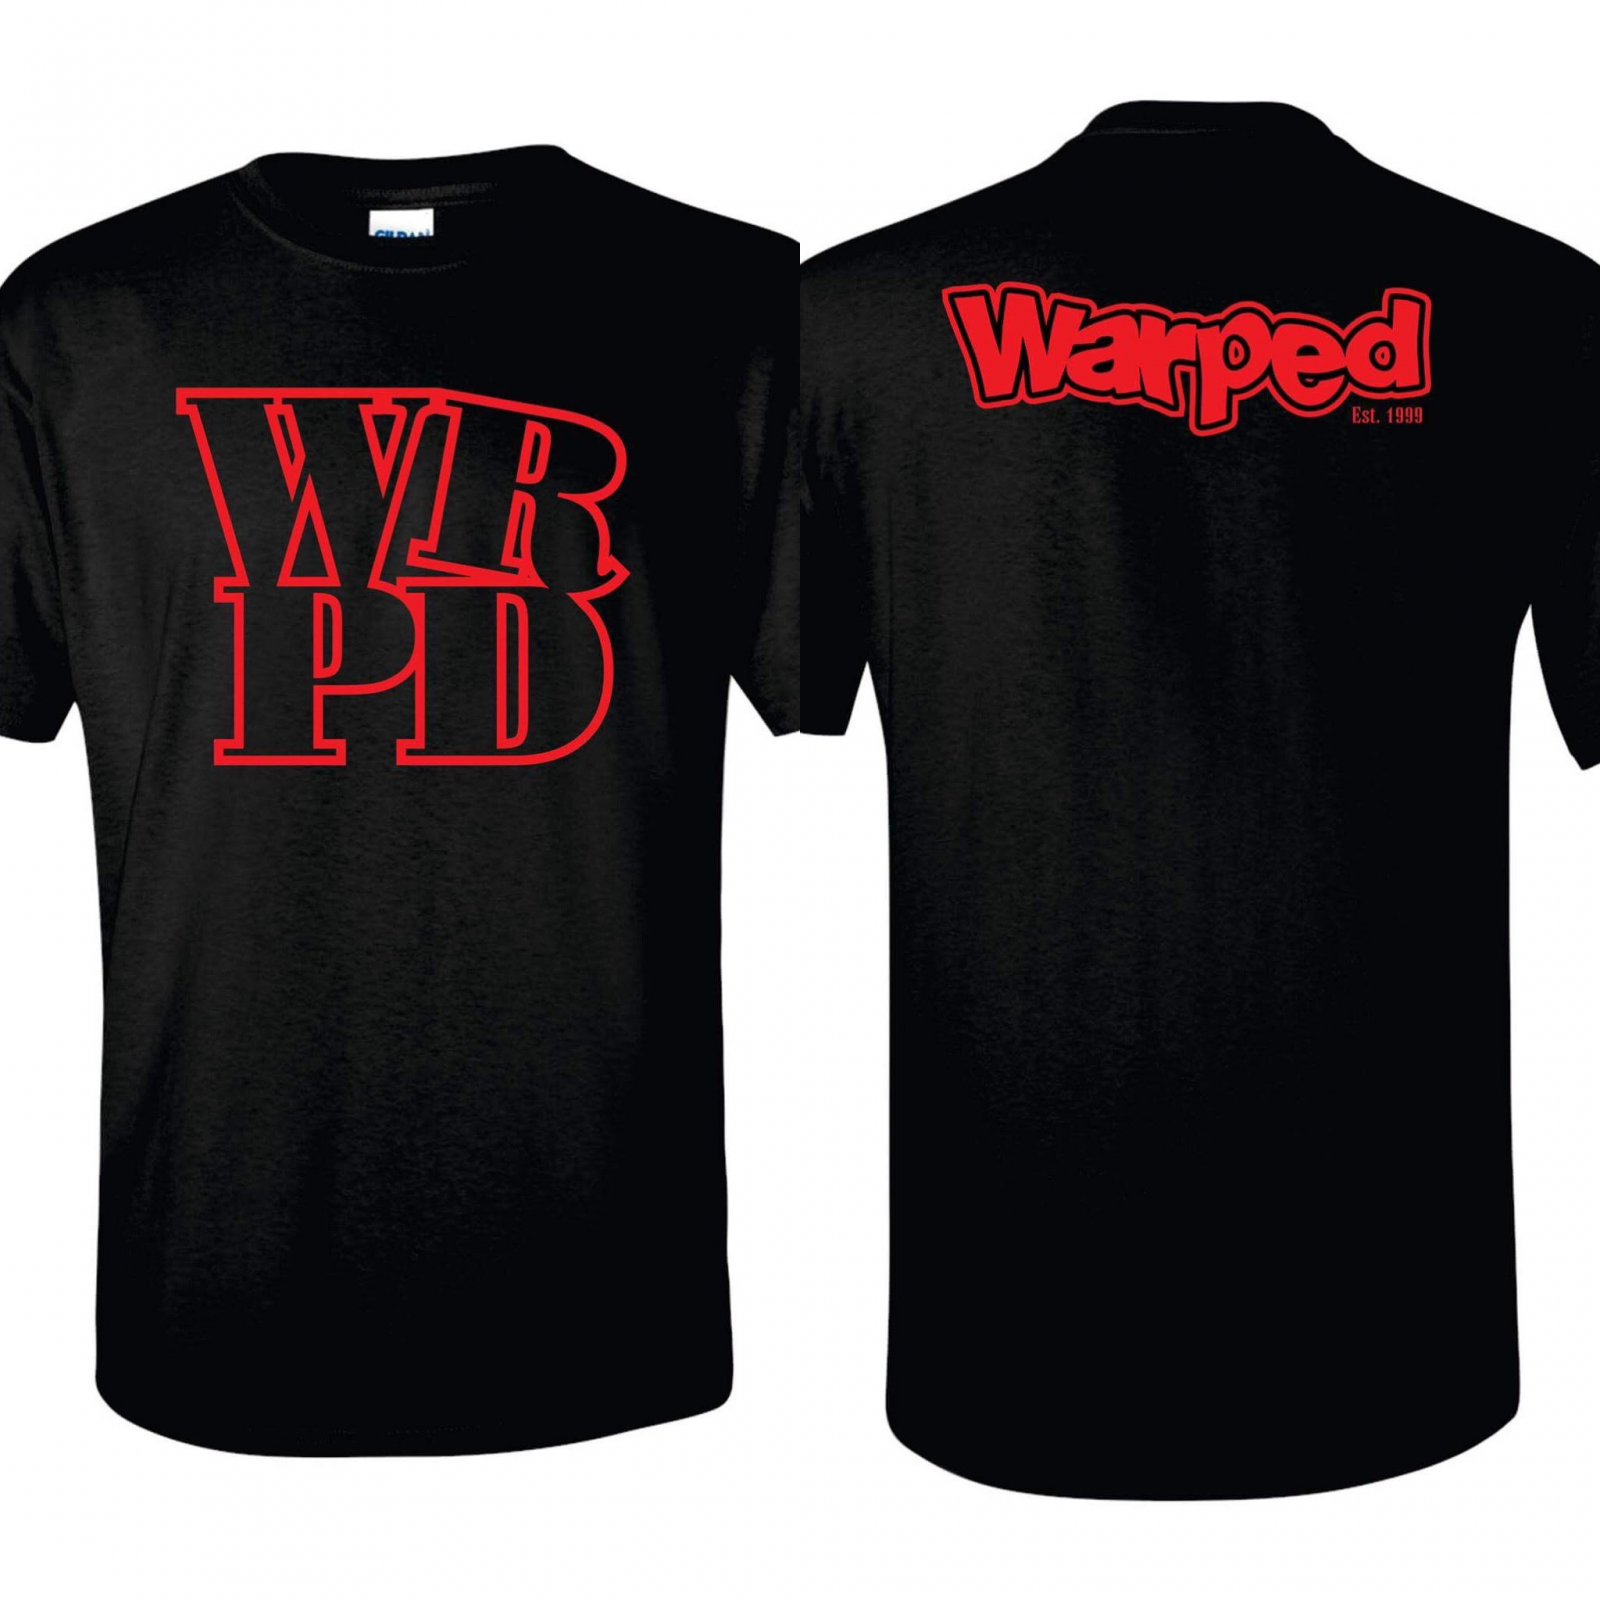 Warped WRPD T Shirt (Black)